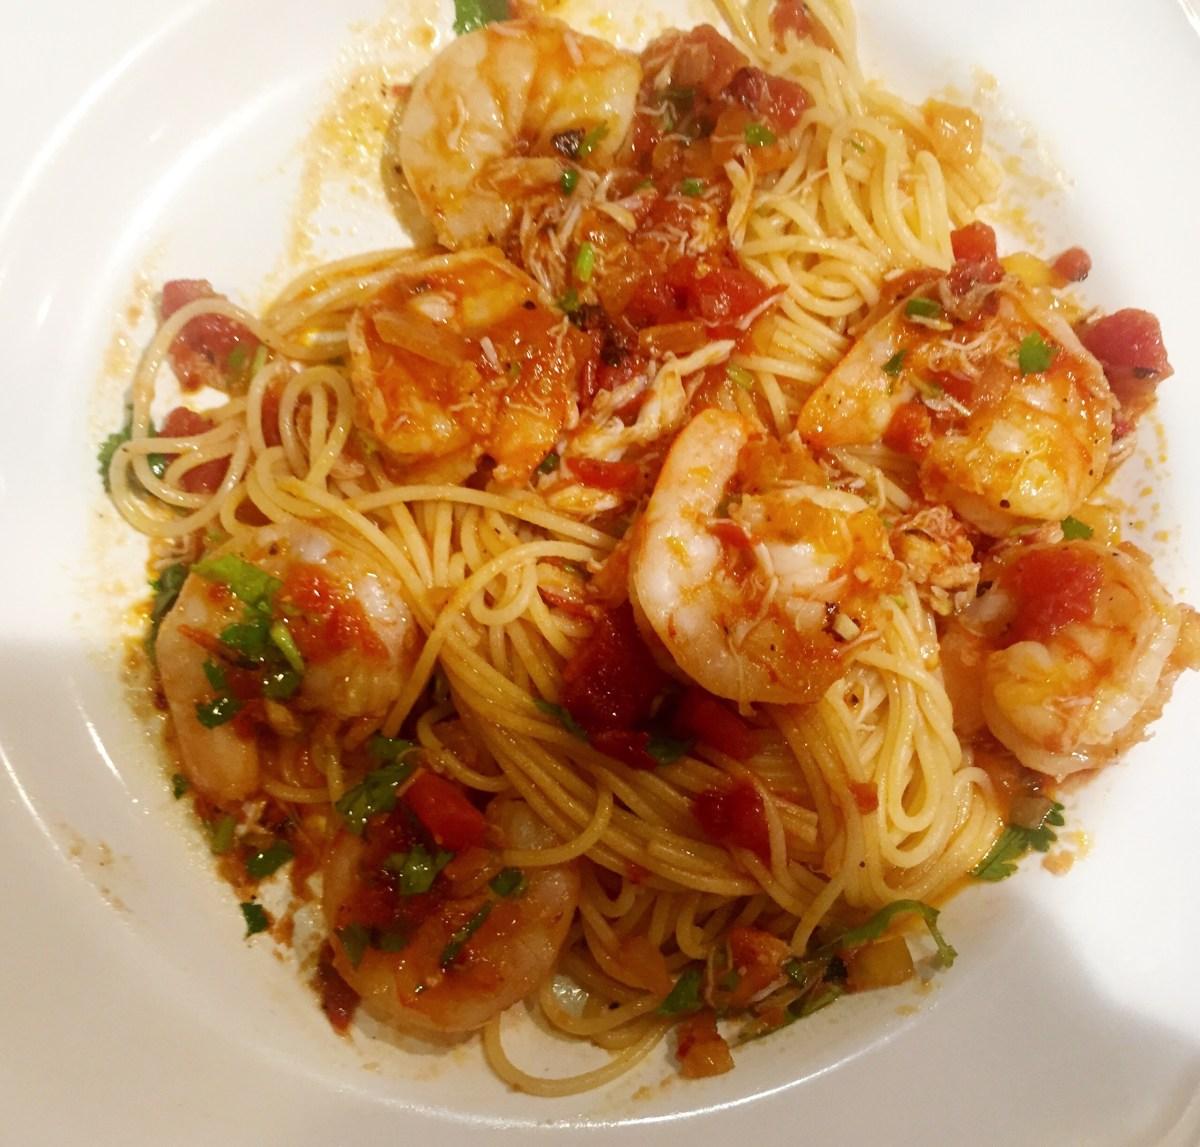 Sunday Supper: Shrimp and Lump Crab Fra Diavolo